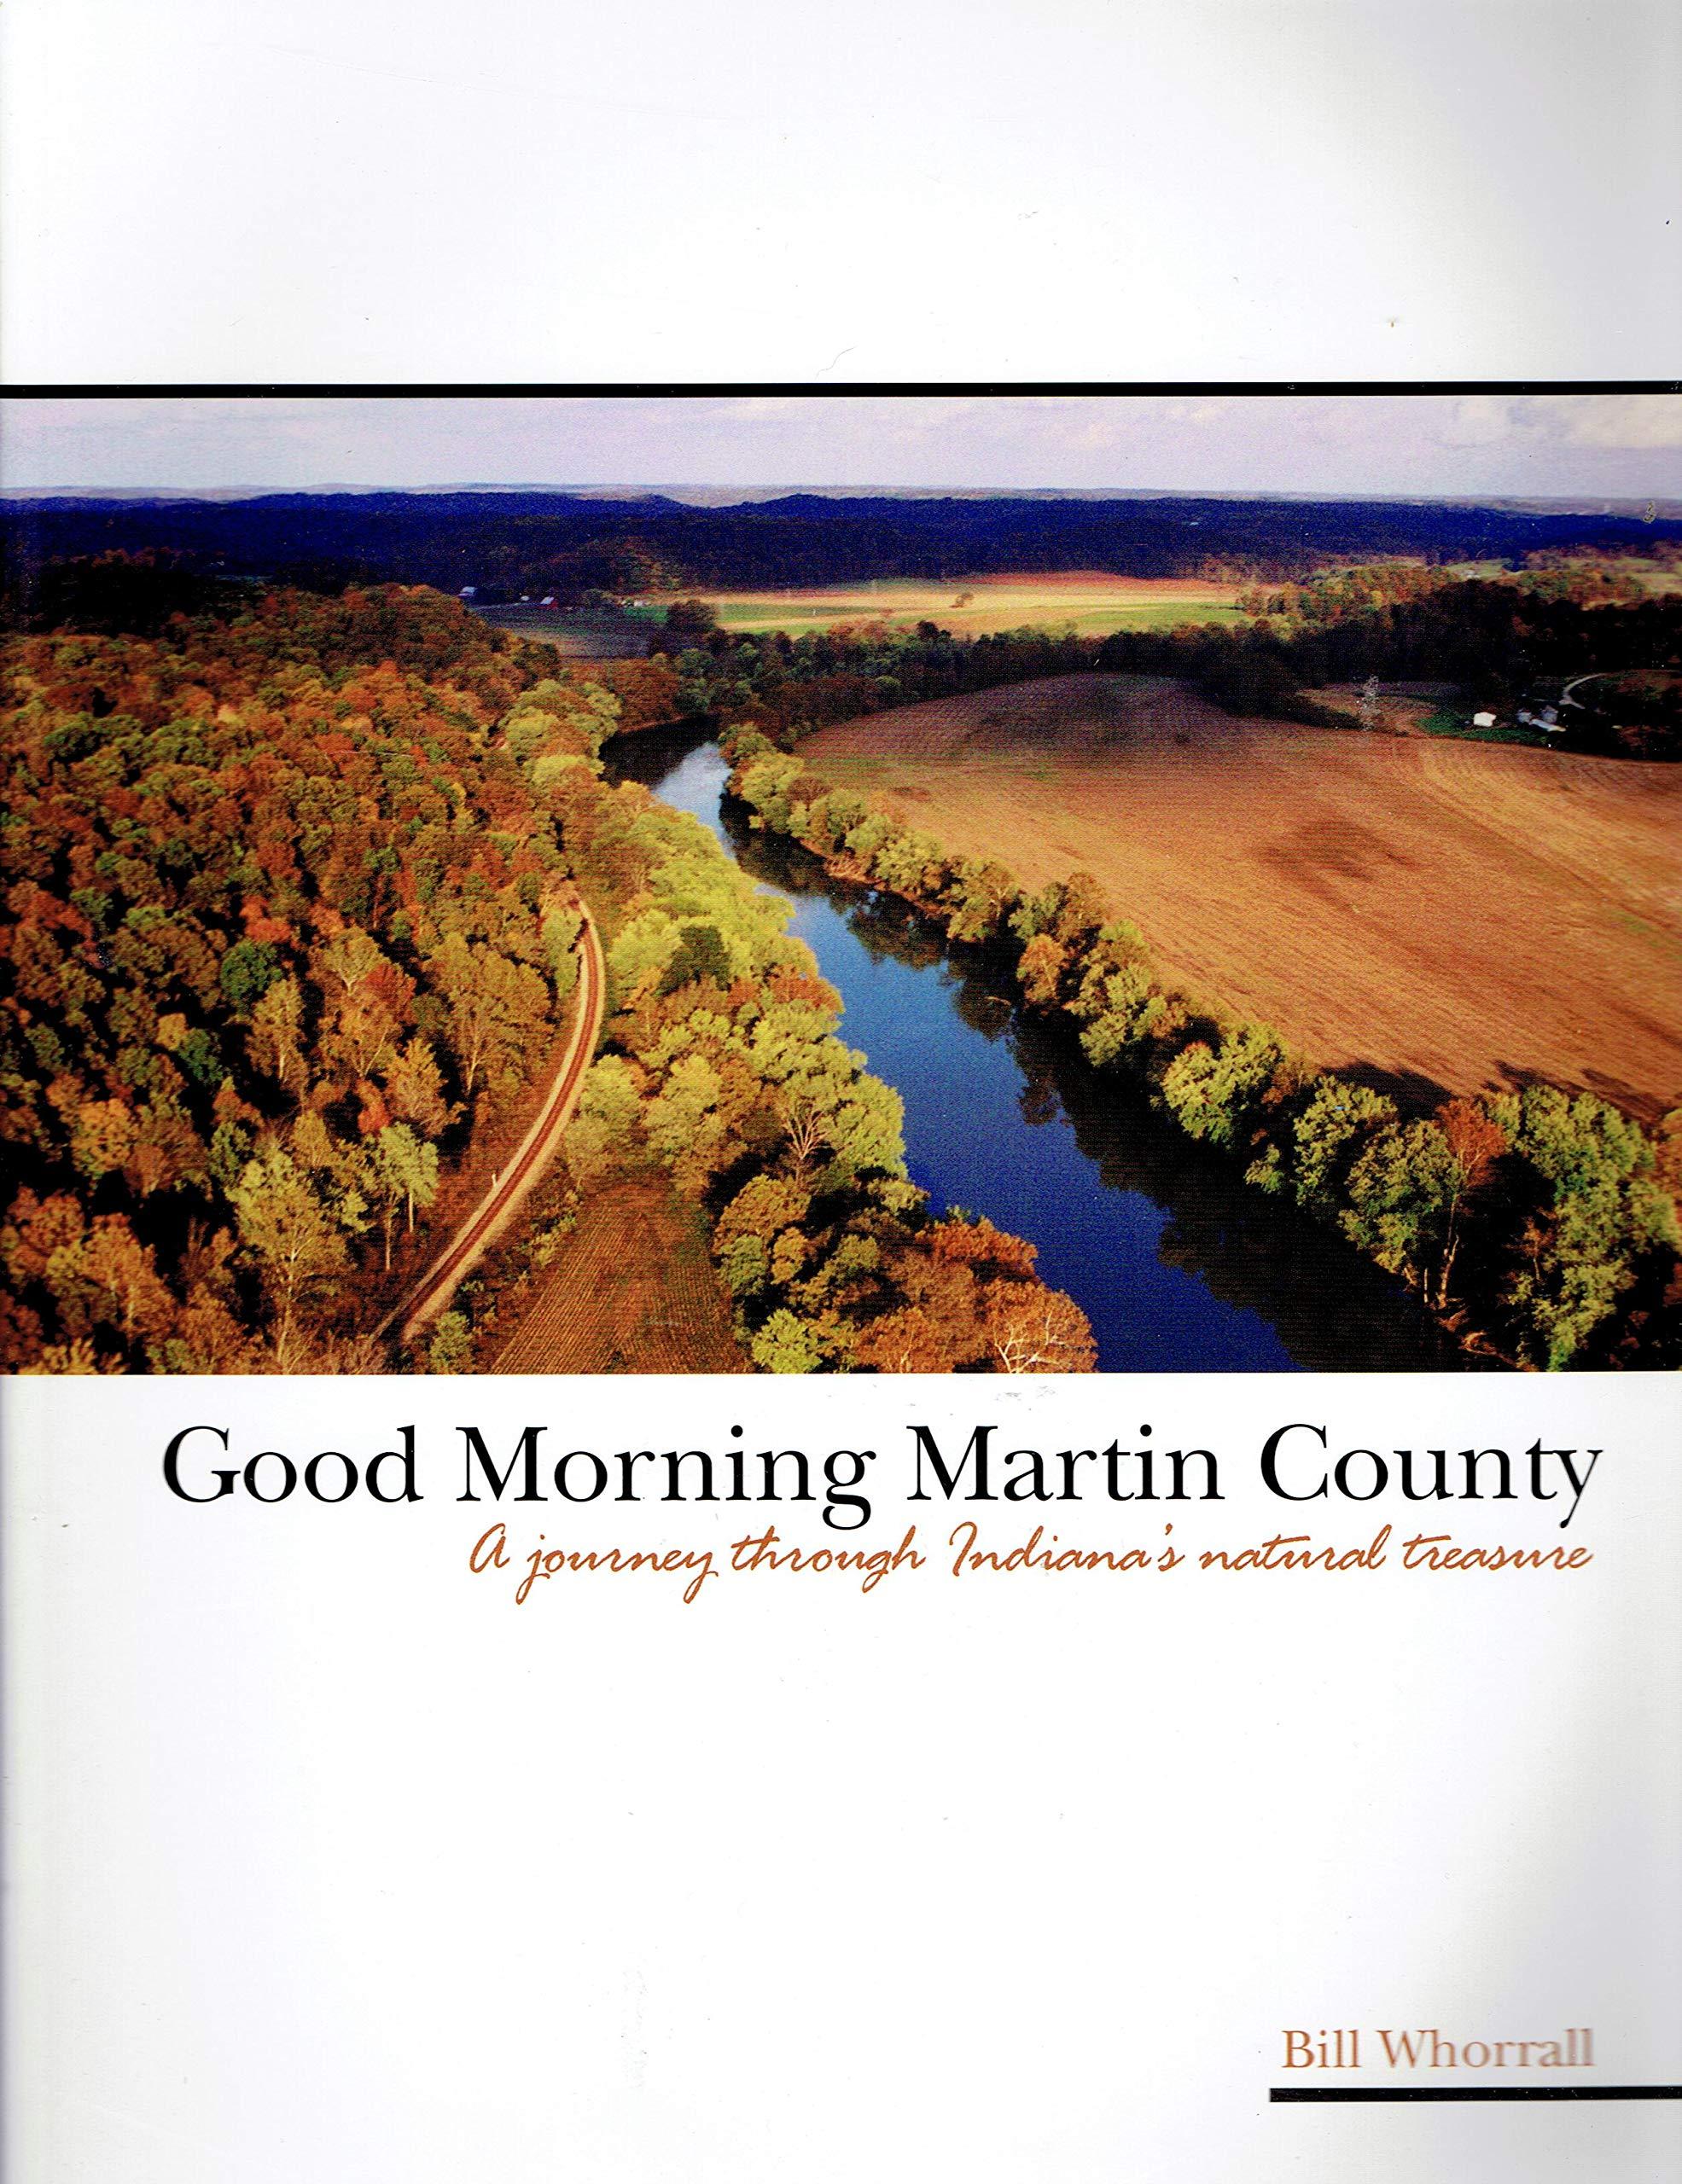 Good Morning Martin County A Journey Through Indiana S Natural Treasures 9780979609305 Amazon Com Books